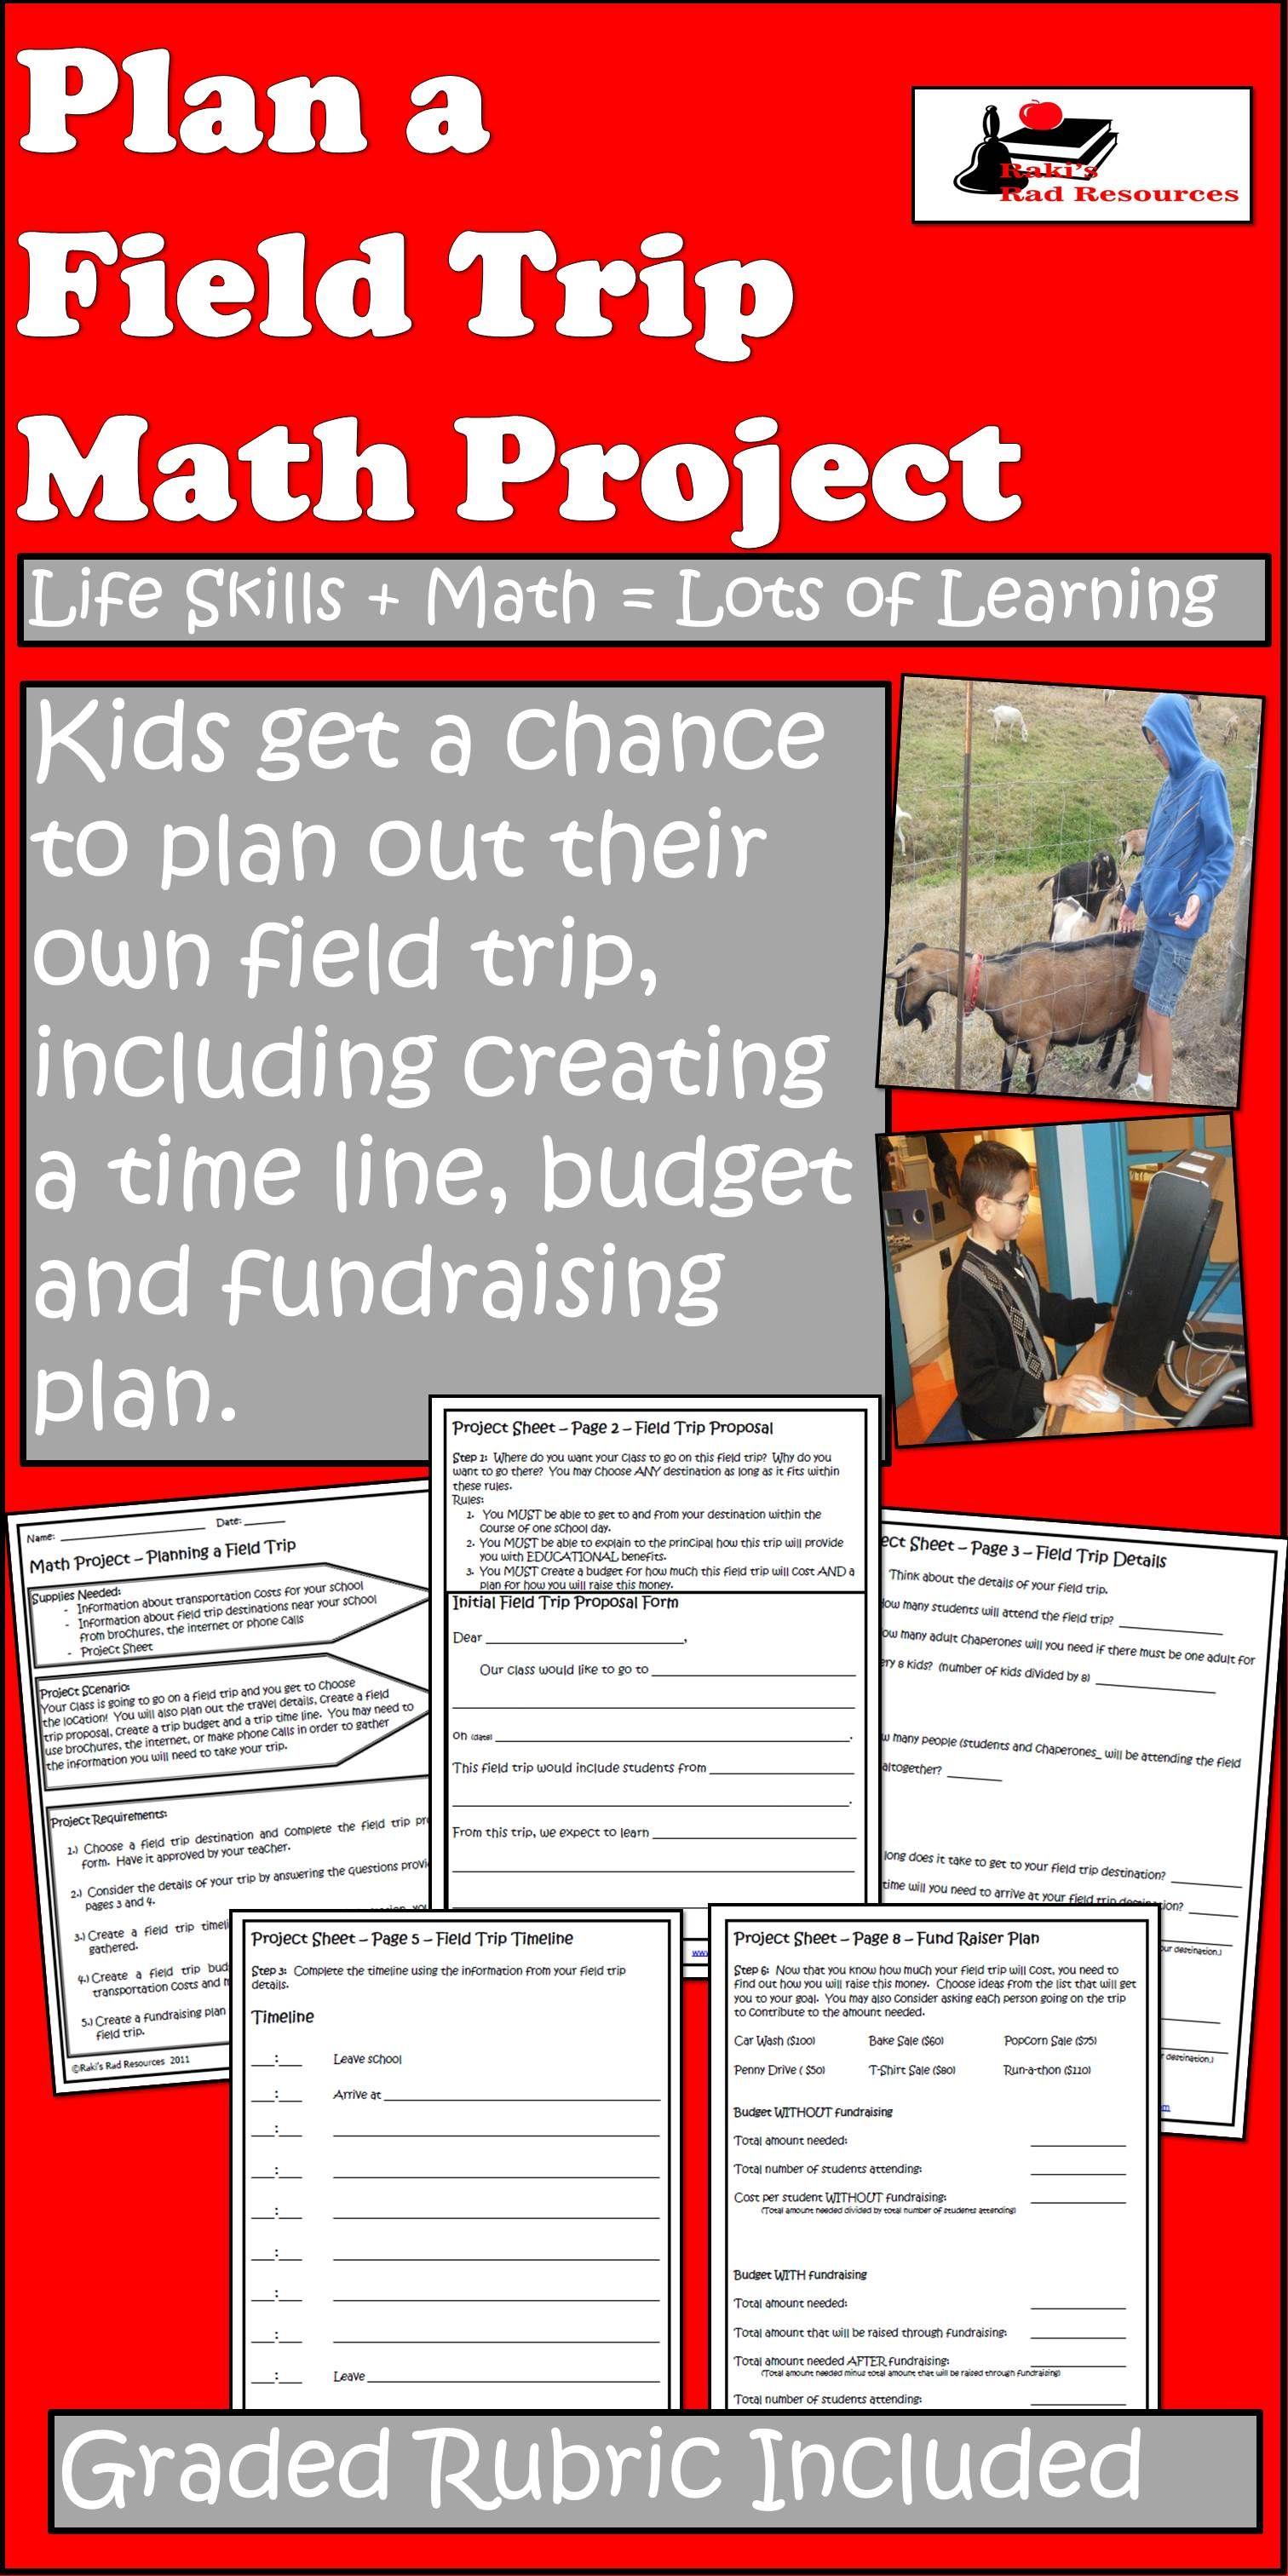 Planning a Field Trip - Math Project | Math projects, Field trips ...